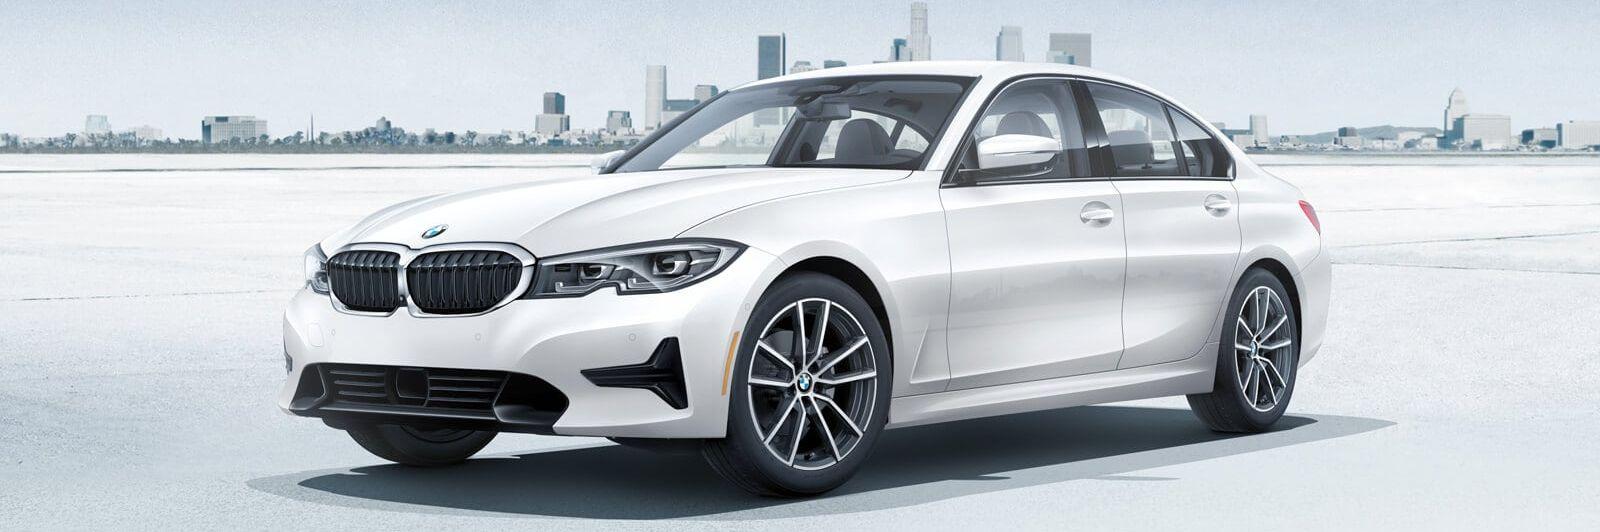 2020 BMW 3 Series Financing near Vero Beach, FL